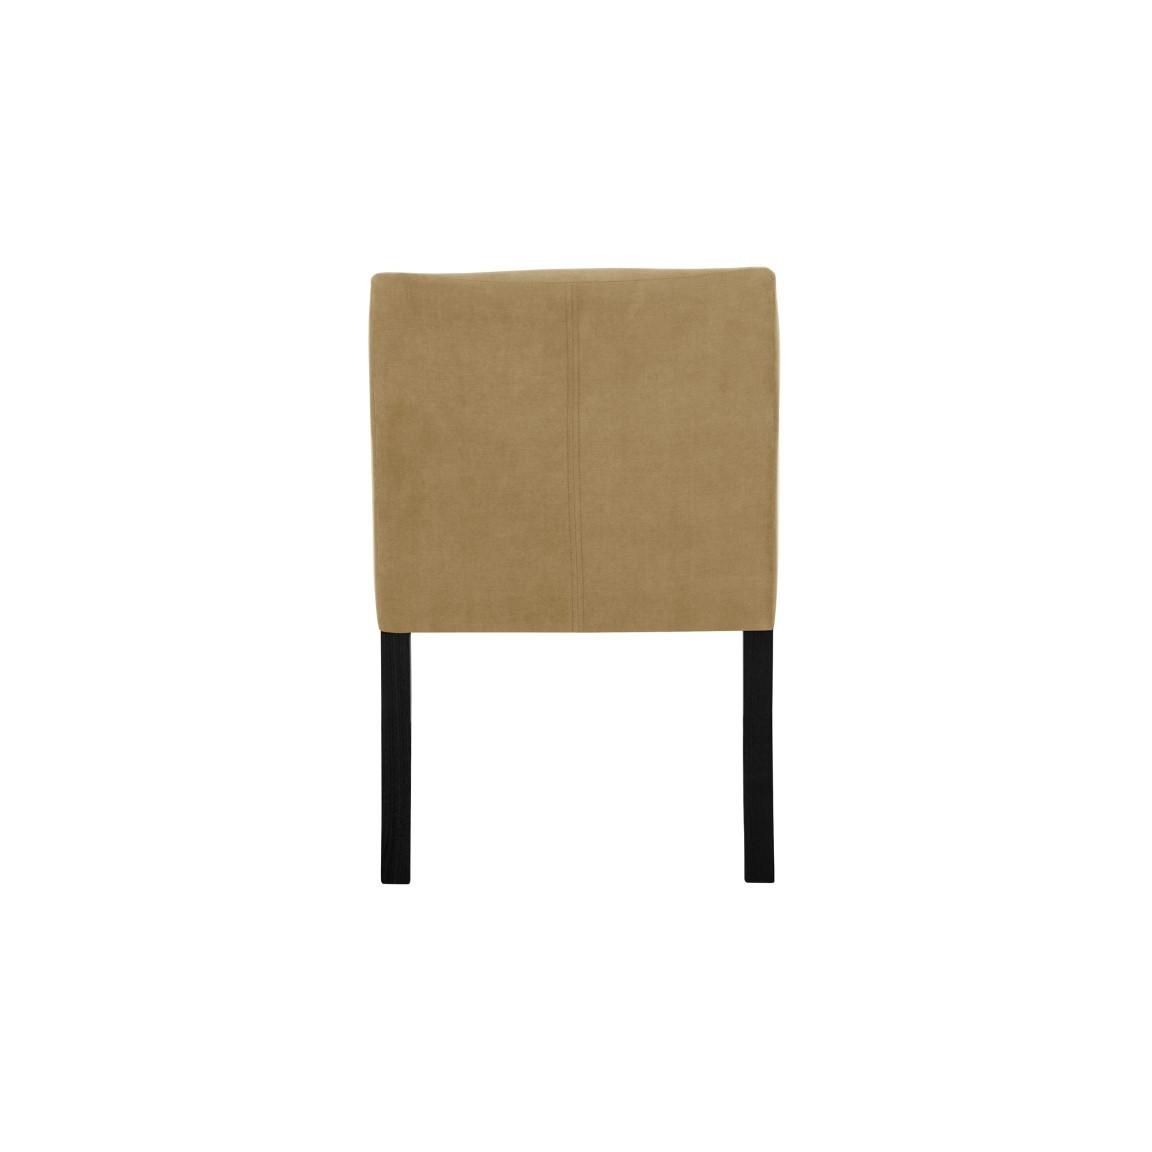 Chaise à Manger Illusion | Caramel